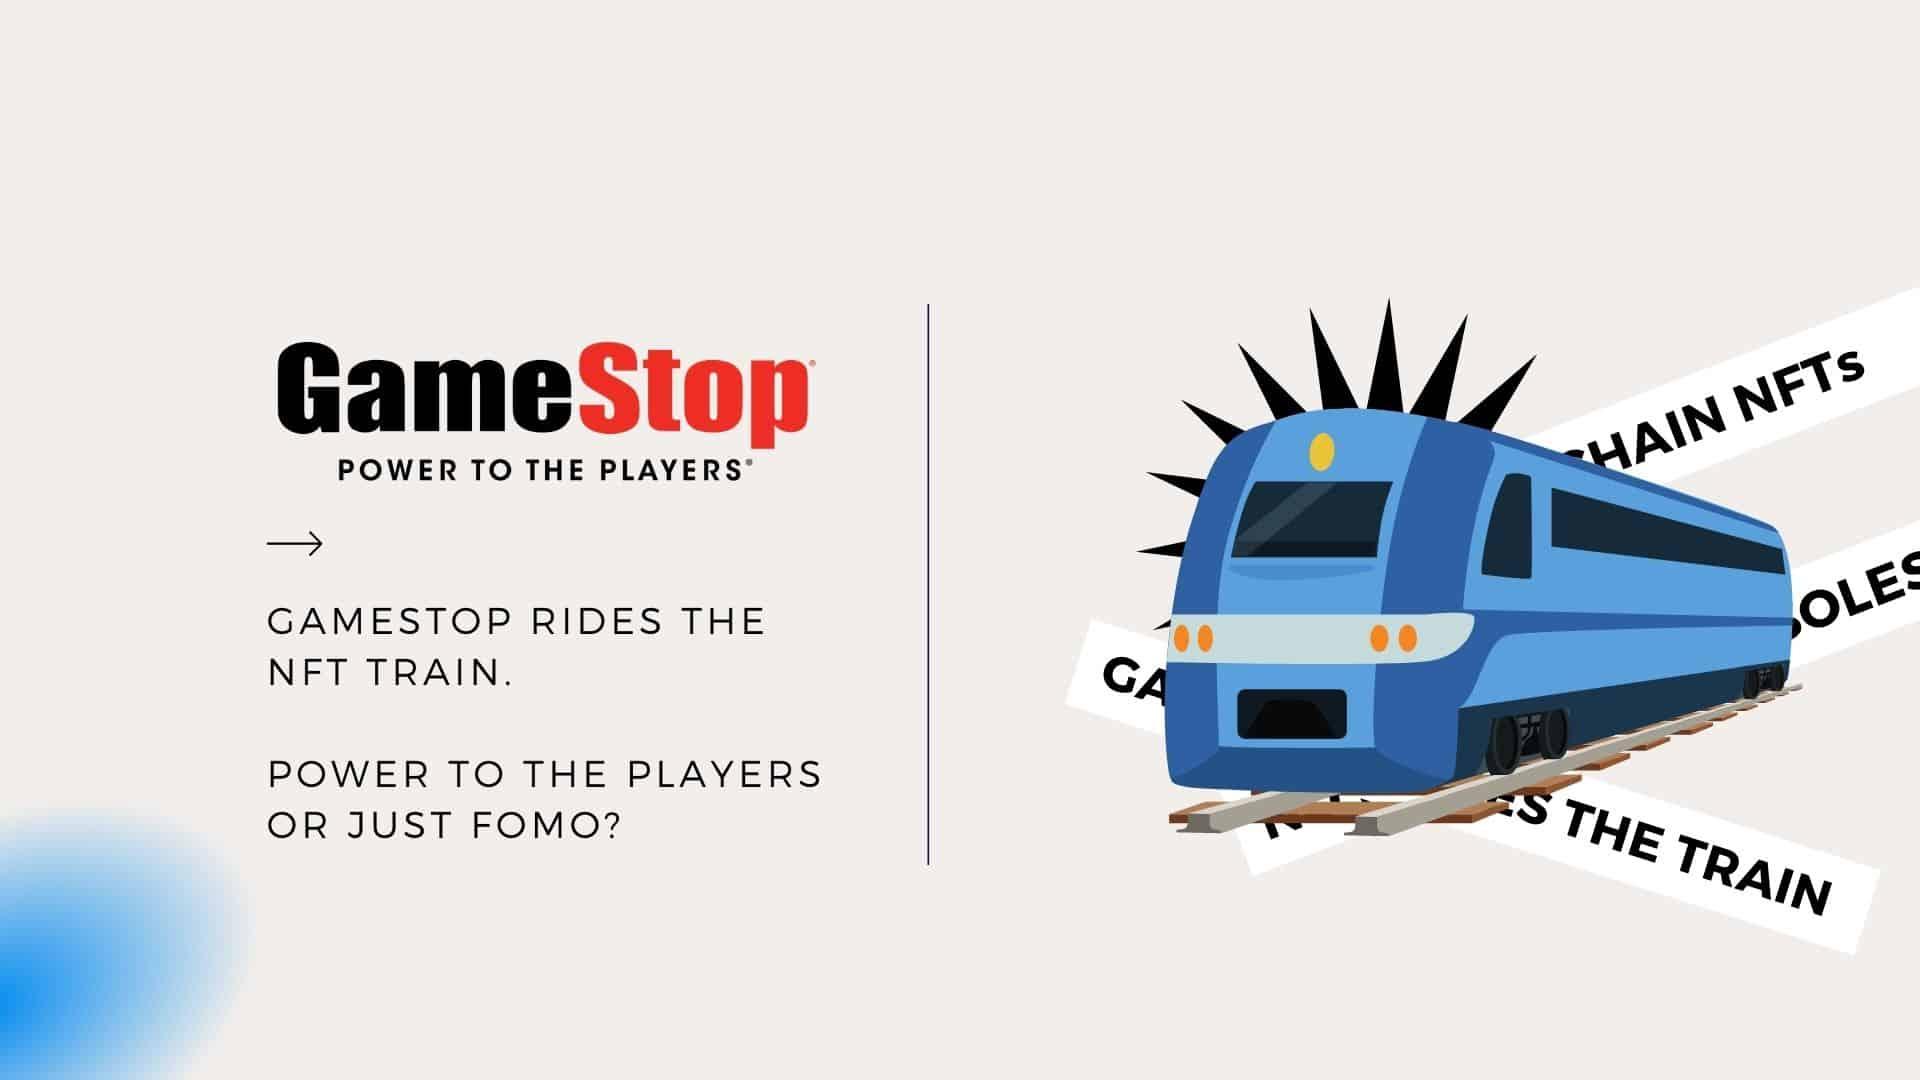 GameStop Rides The NFT Train